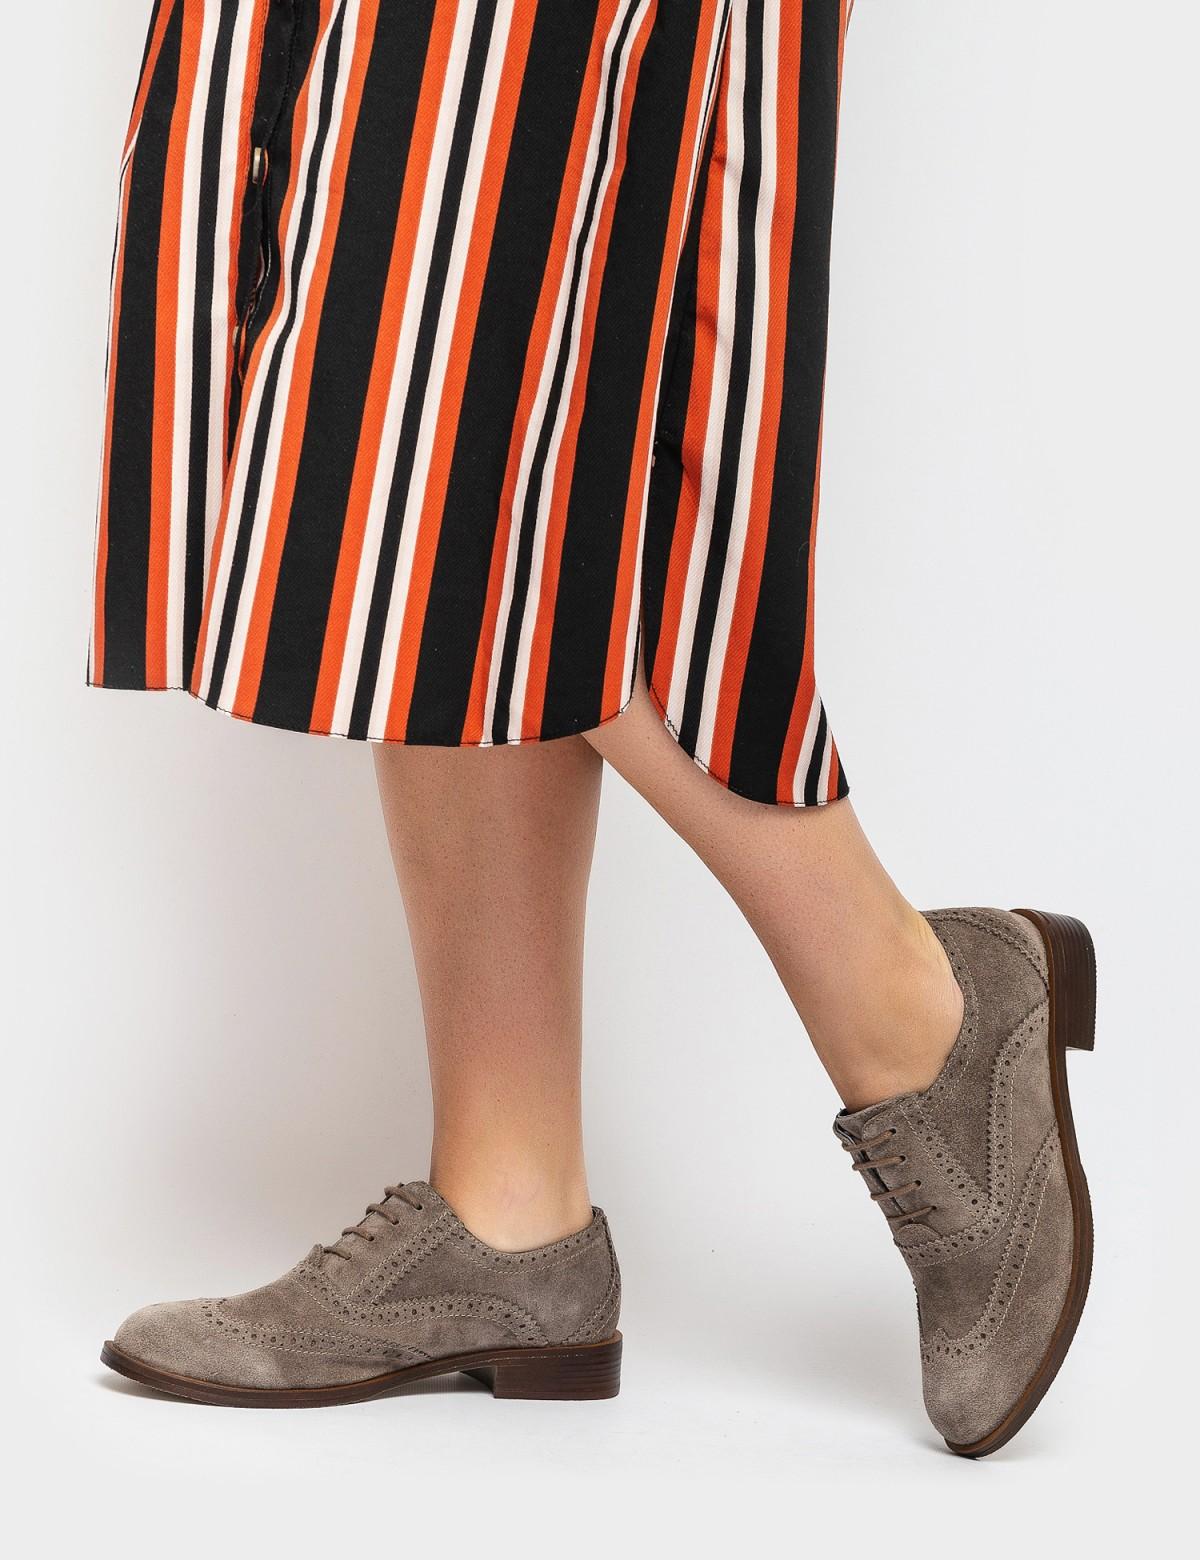 Туфли бежевые. Натуральная замша6